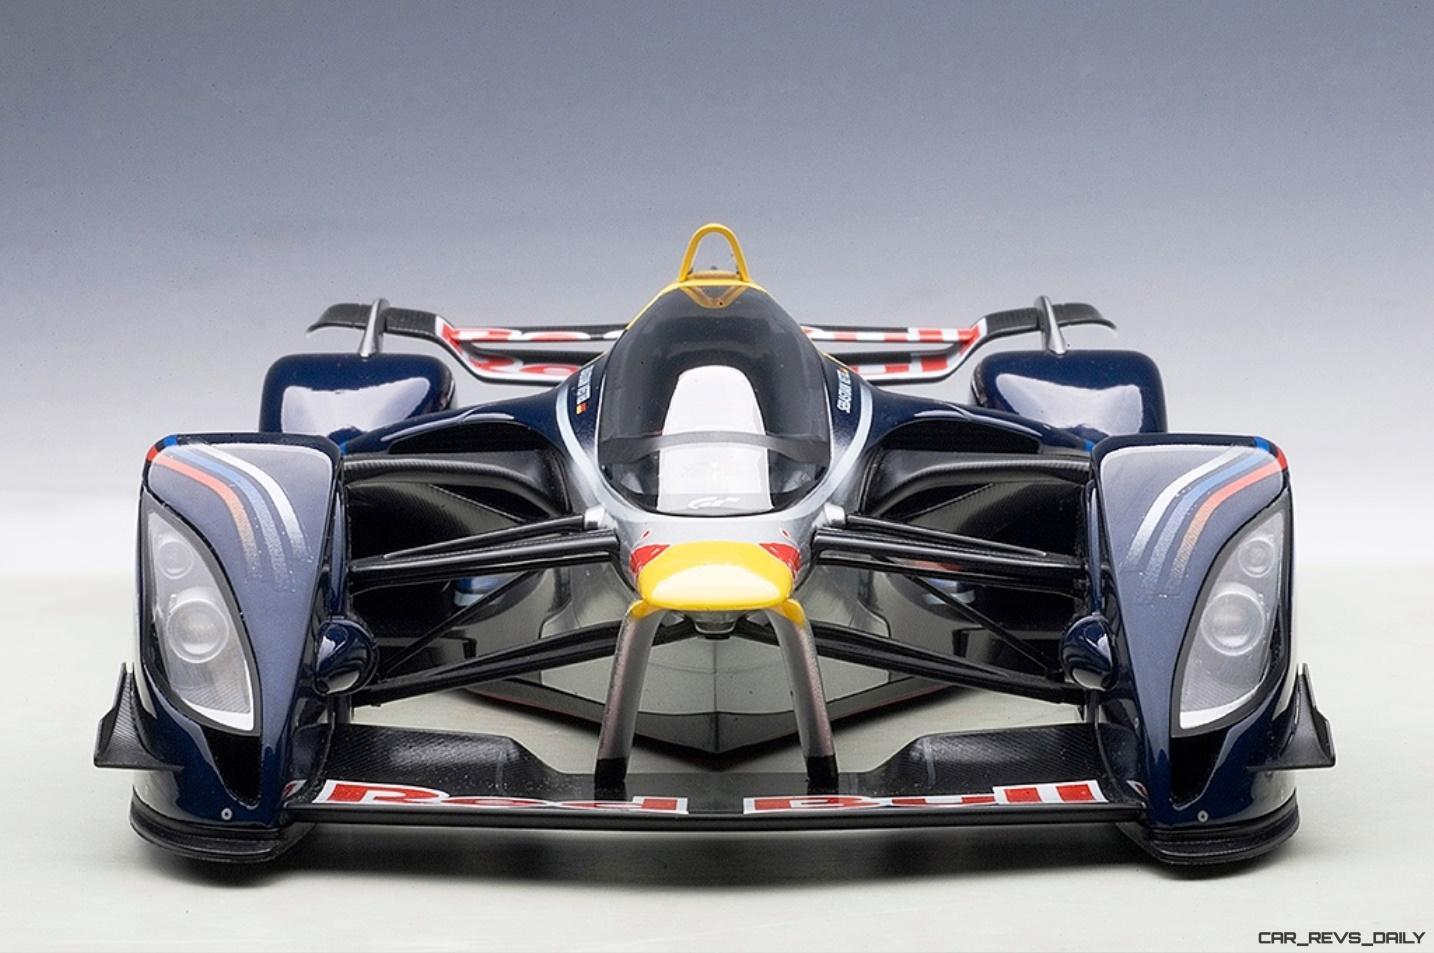 gran turismo red bull x2014 fan car genius racer now. Black Bedroom Furniture Sets. Home Design Ideas